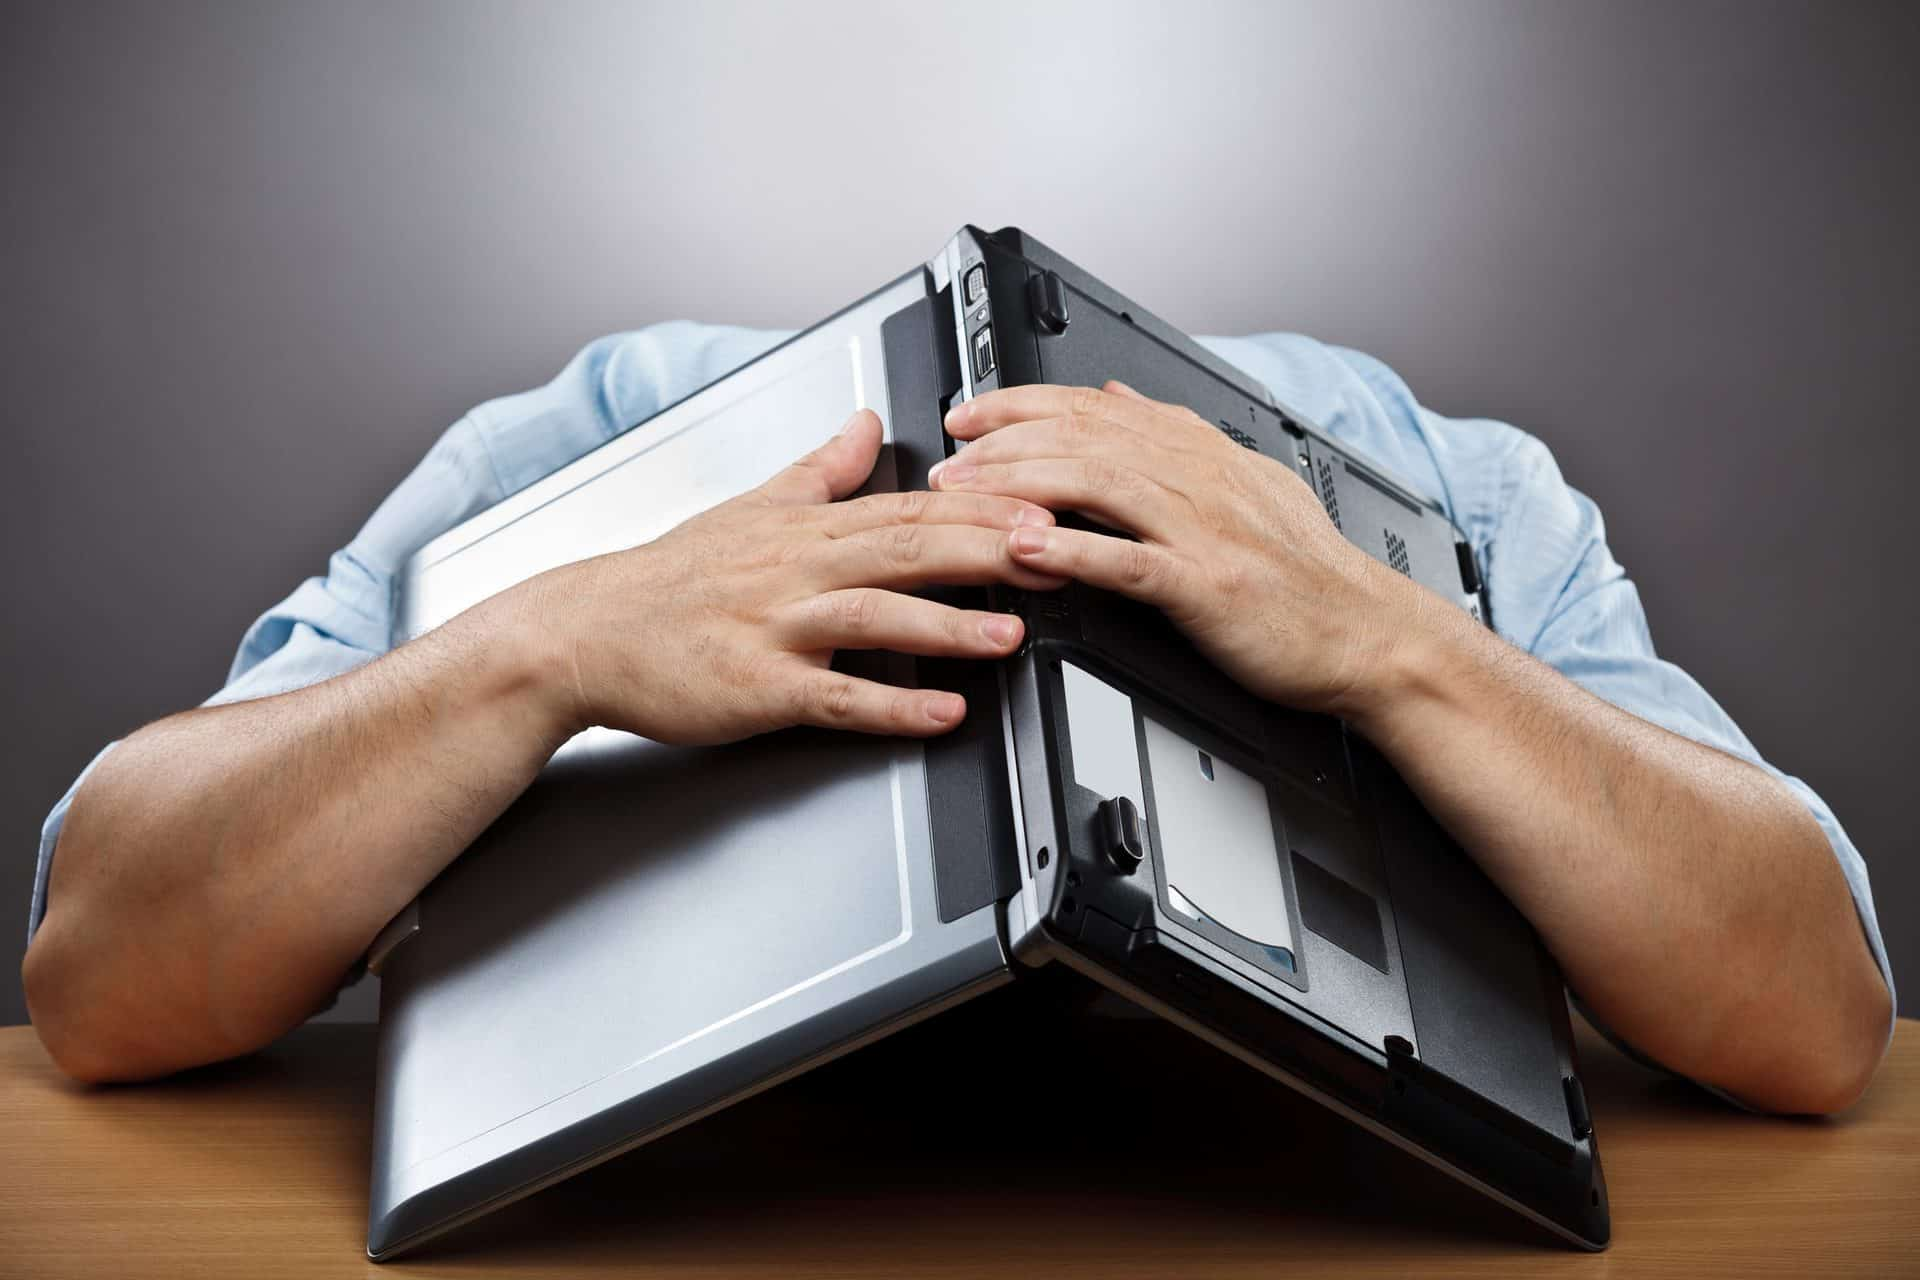 Freelance content writer experiencing writer's block